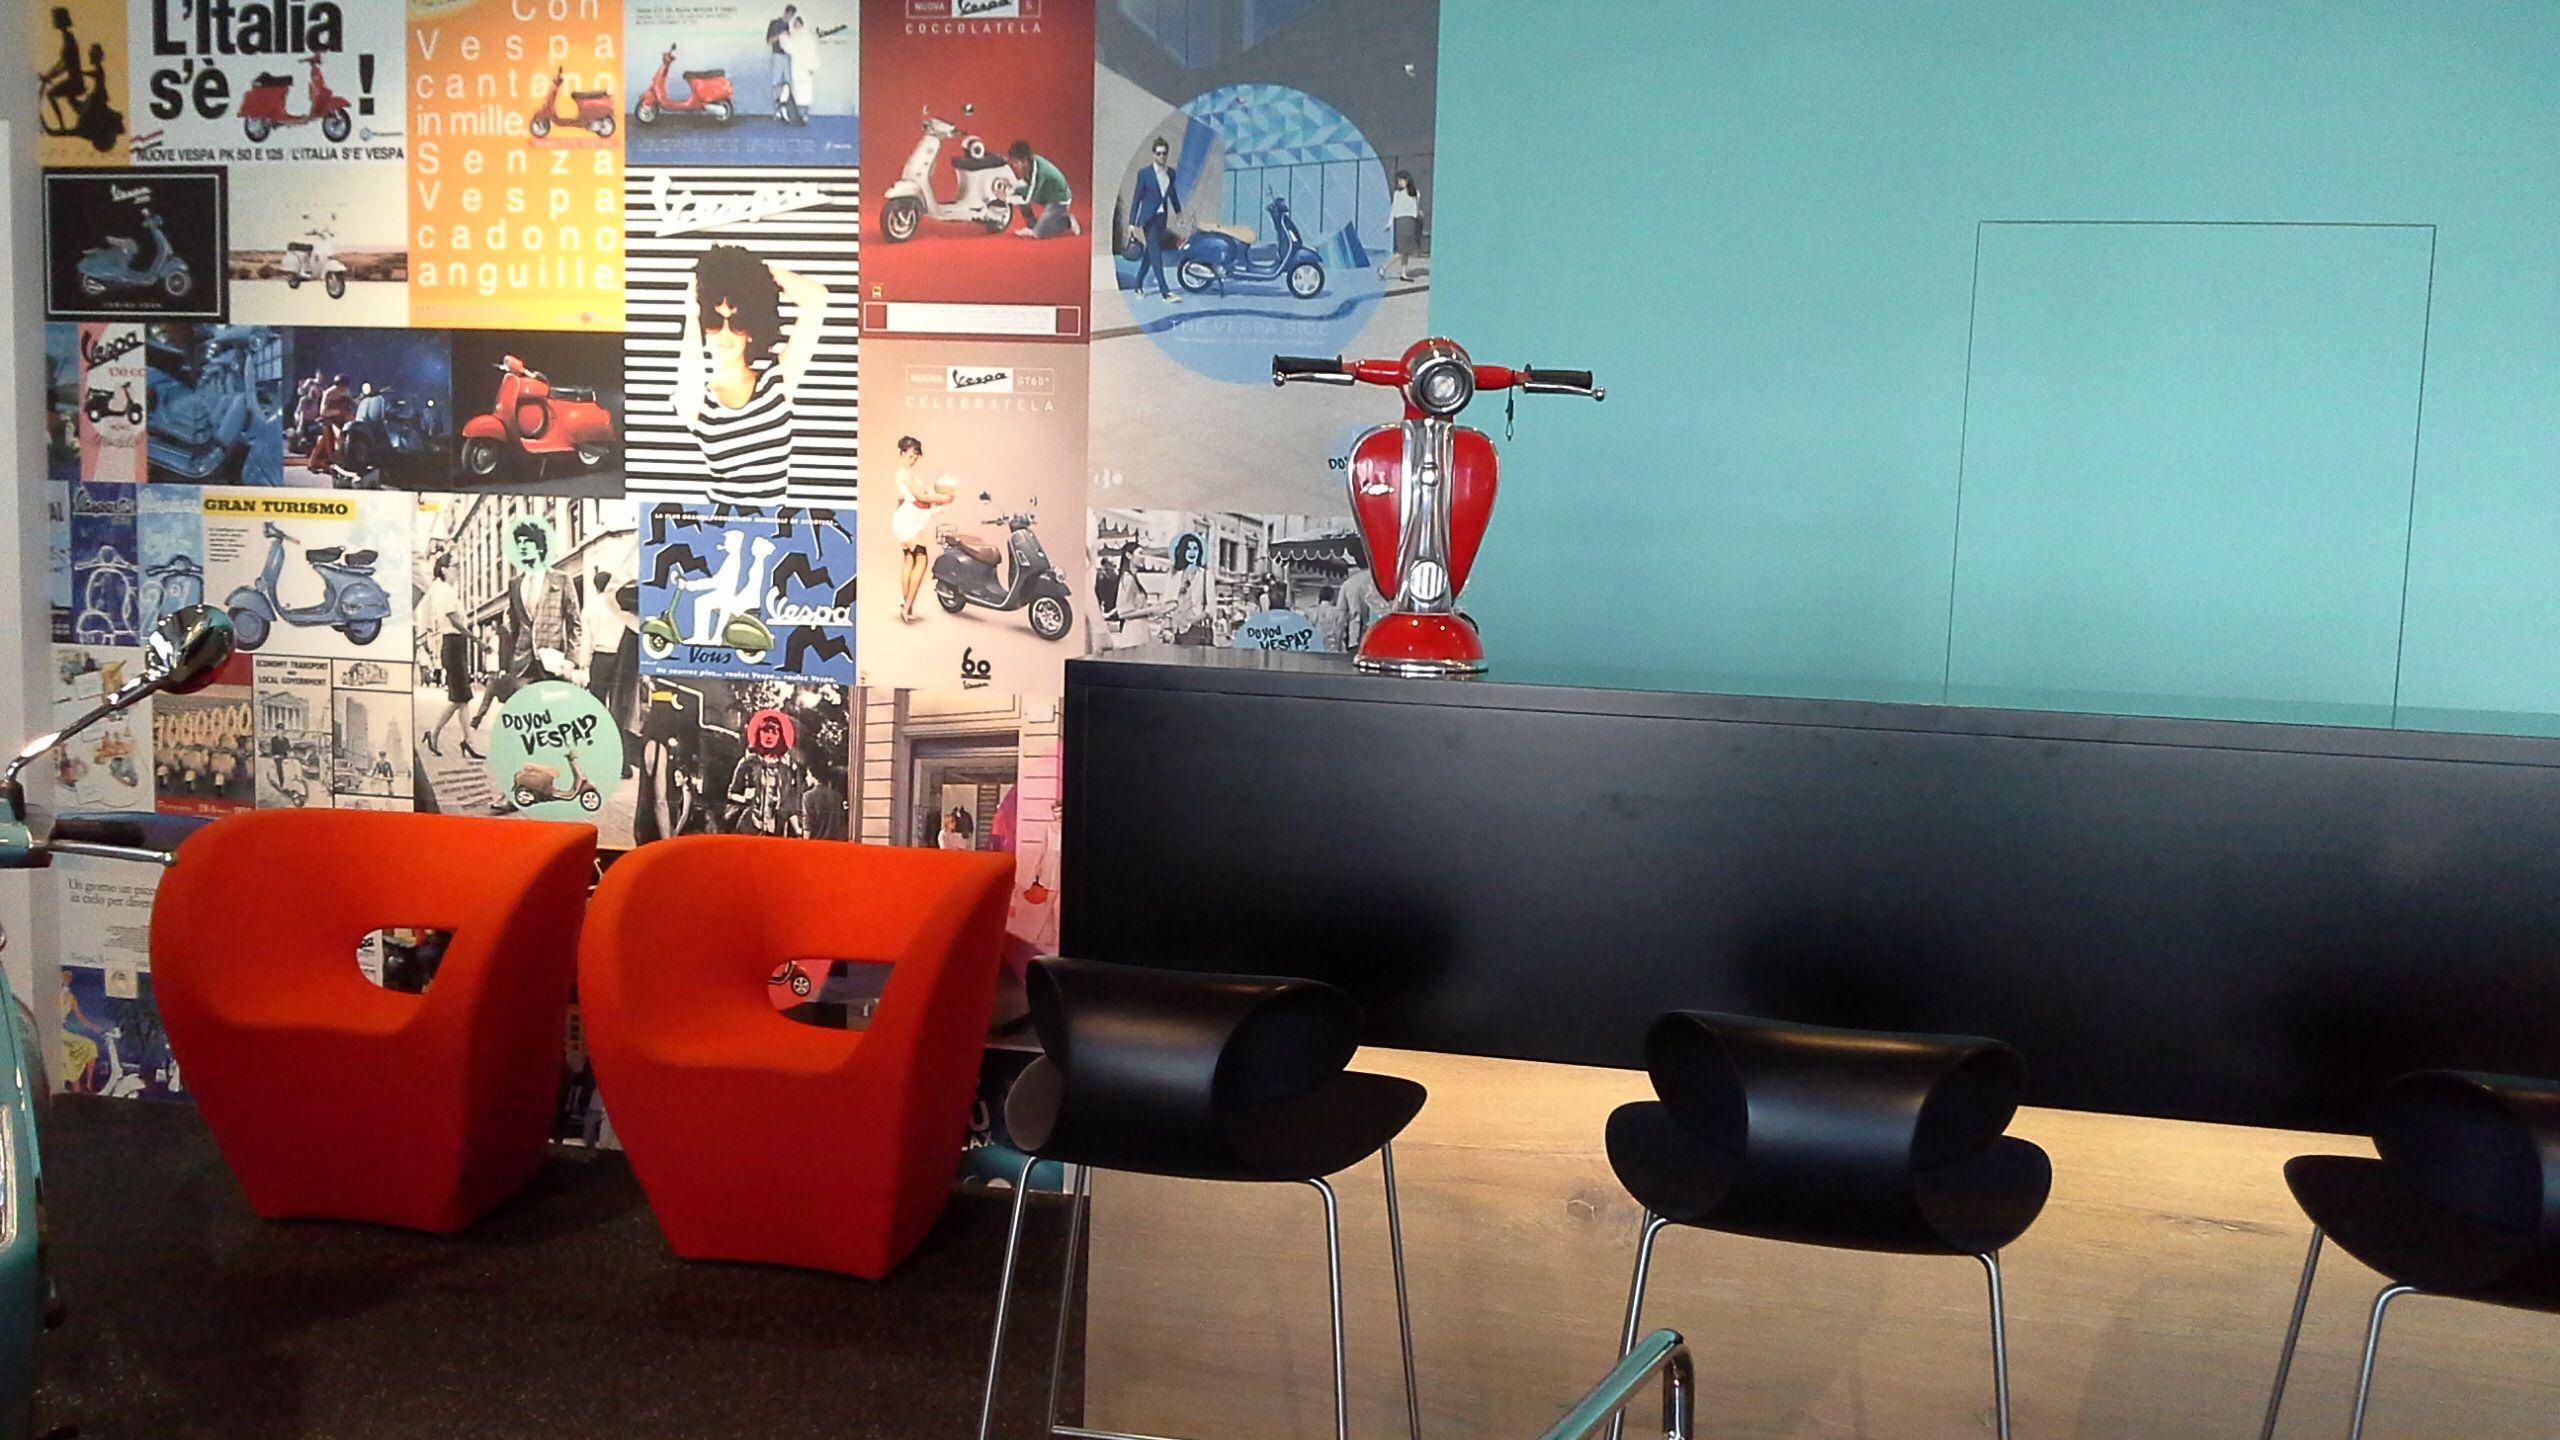 holiday vibes at the vespa shop #interiordesign #retaildesign